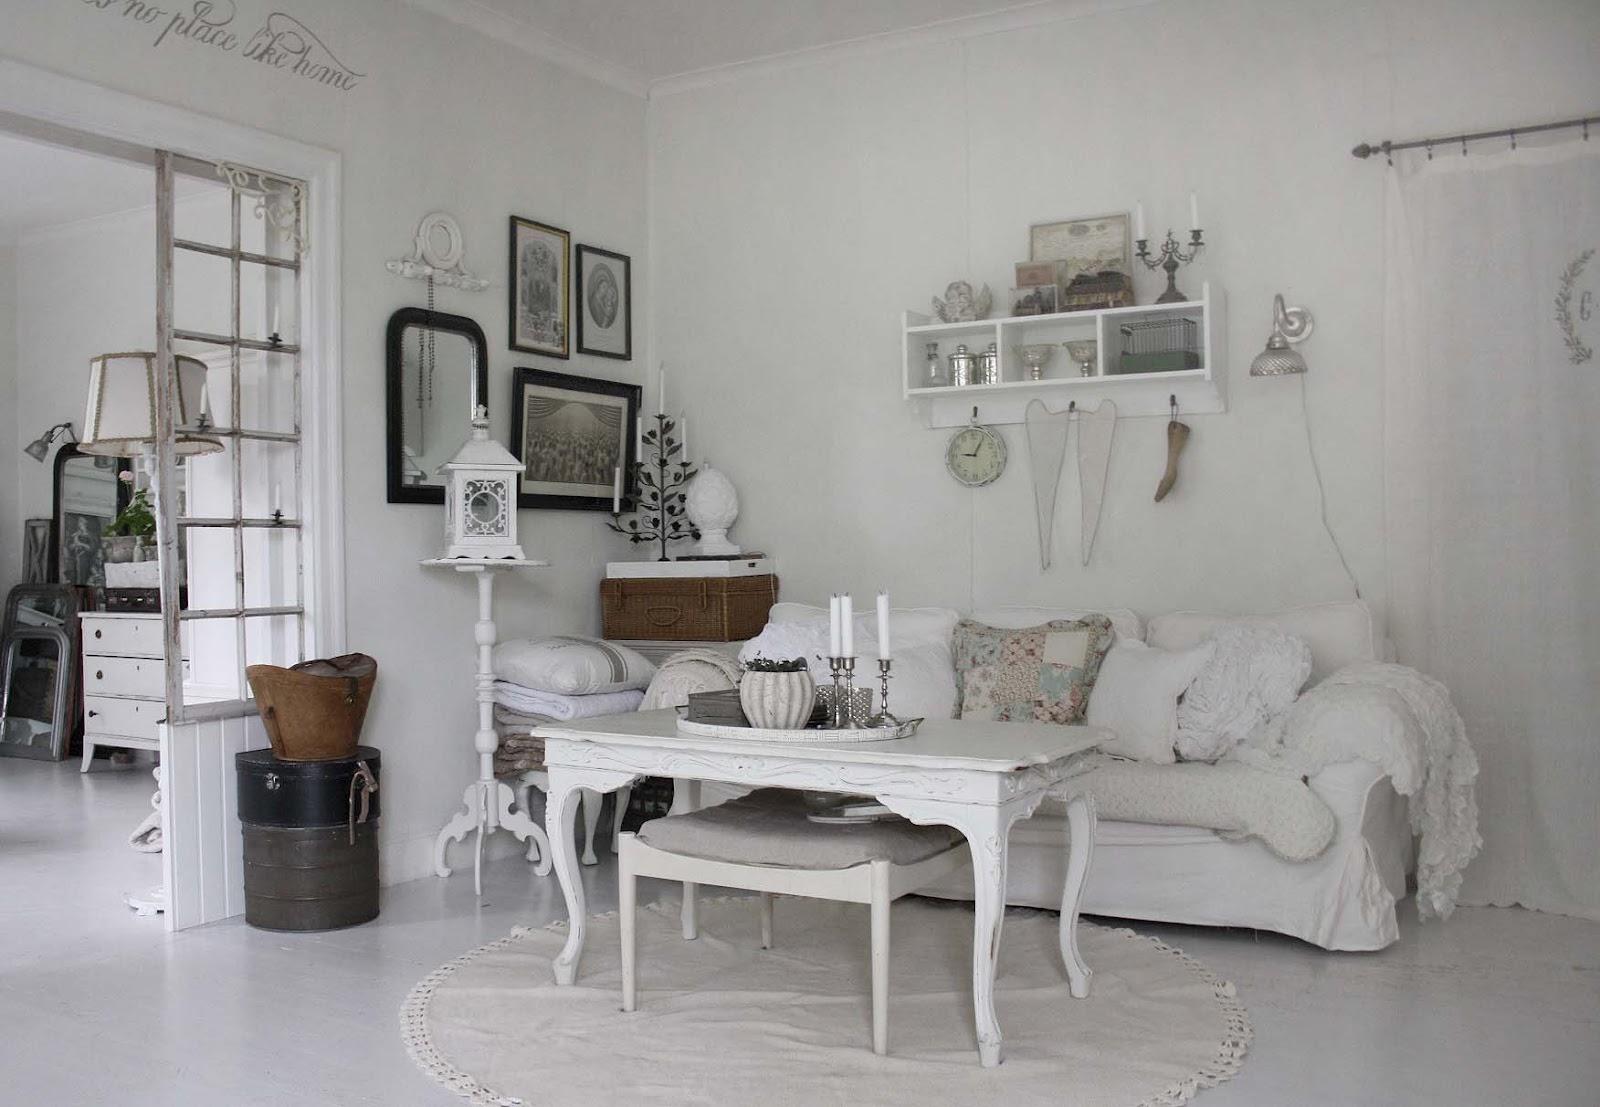 shabby chic living room decorating ideas open concept kitchen 37 dream designs decoholic 27 via girls vintage white chabby interior